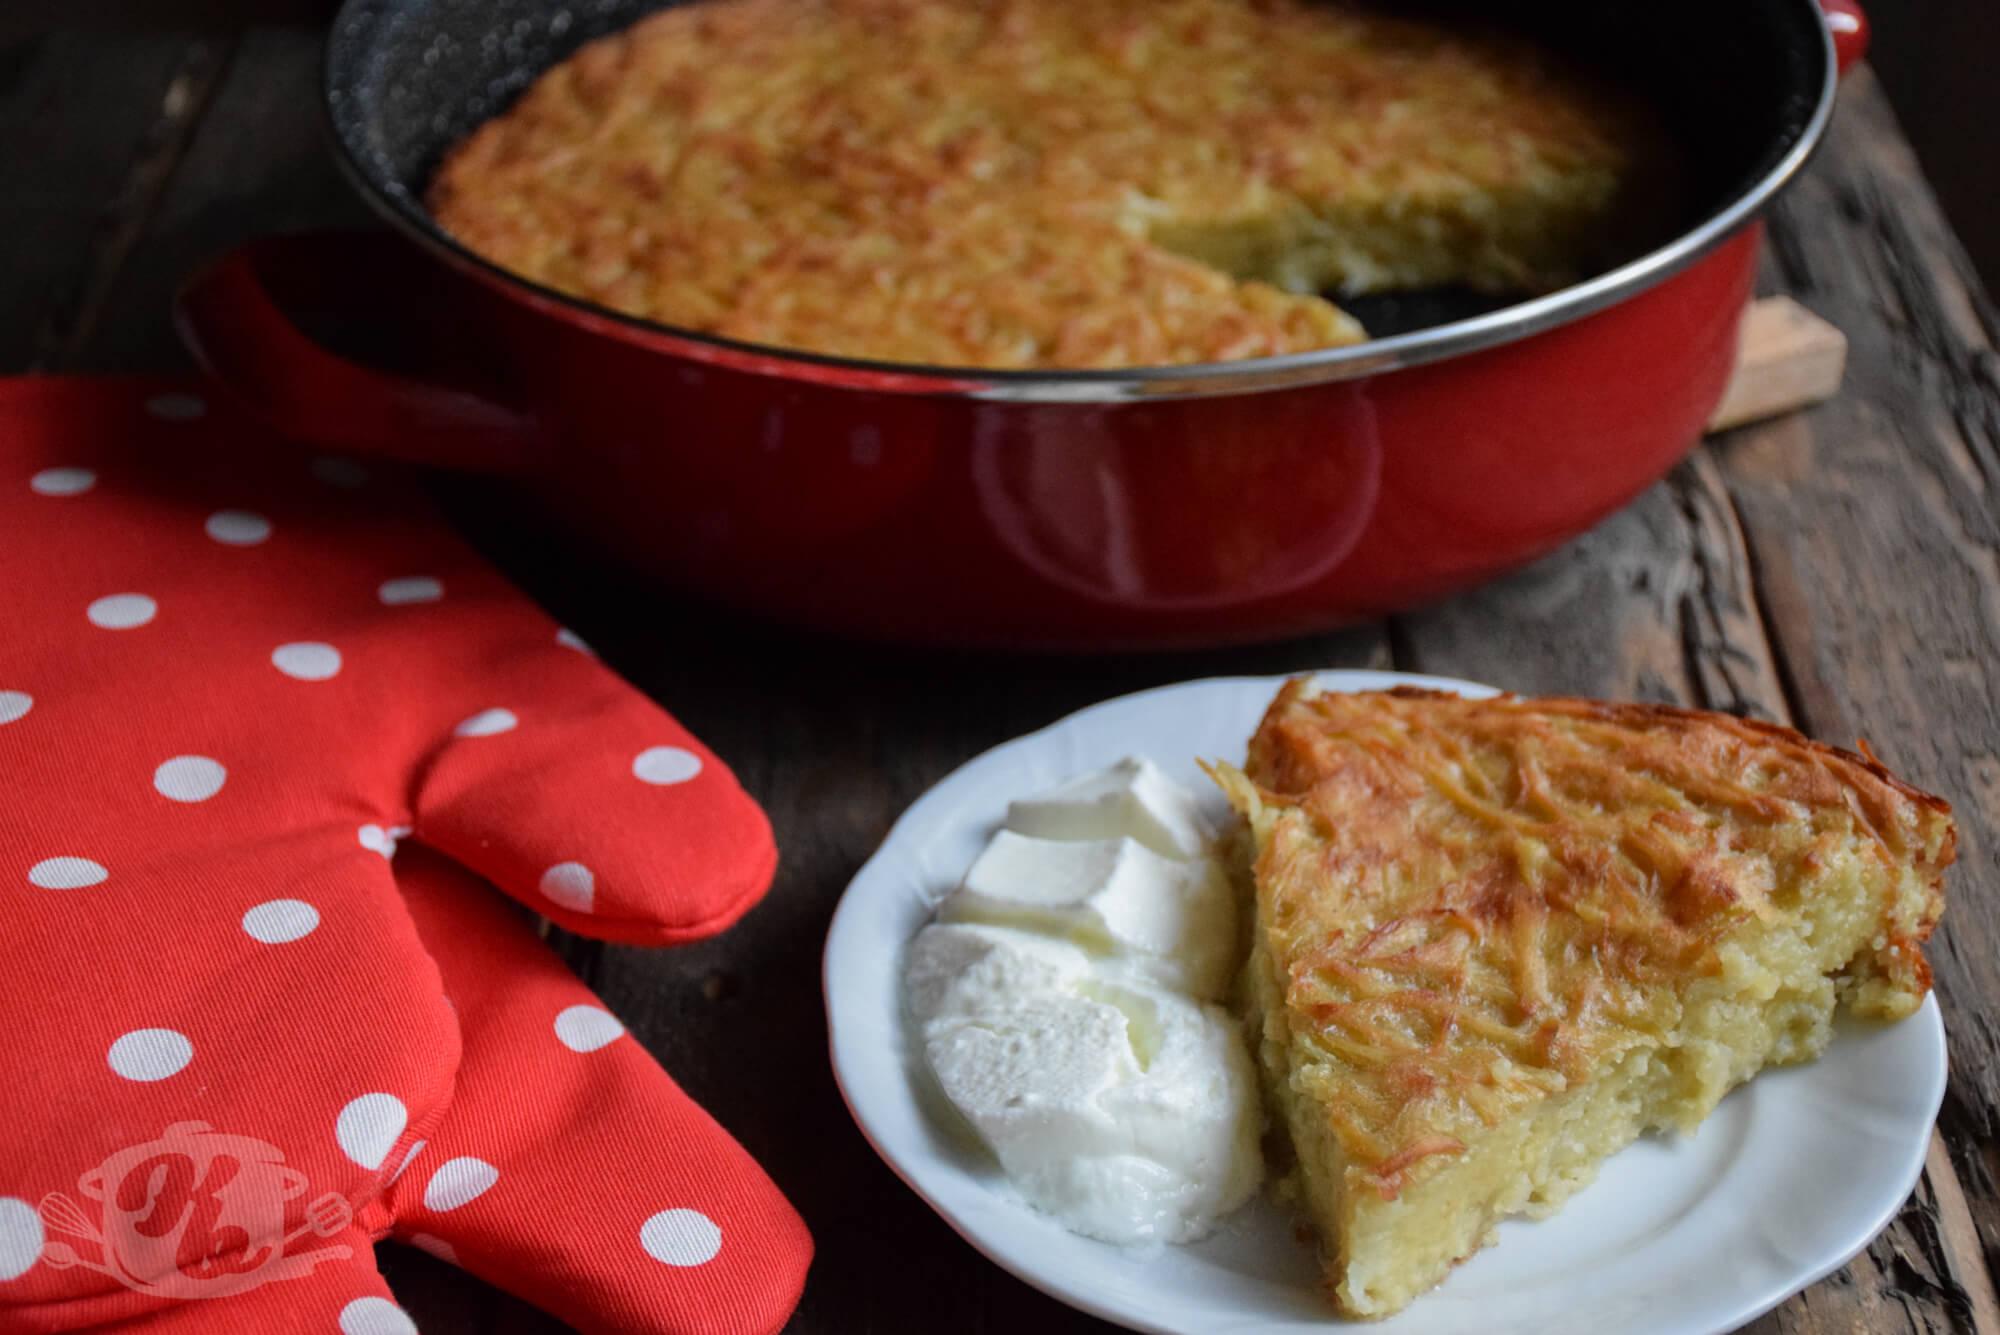 Brza pita sa krompirom - bez kora